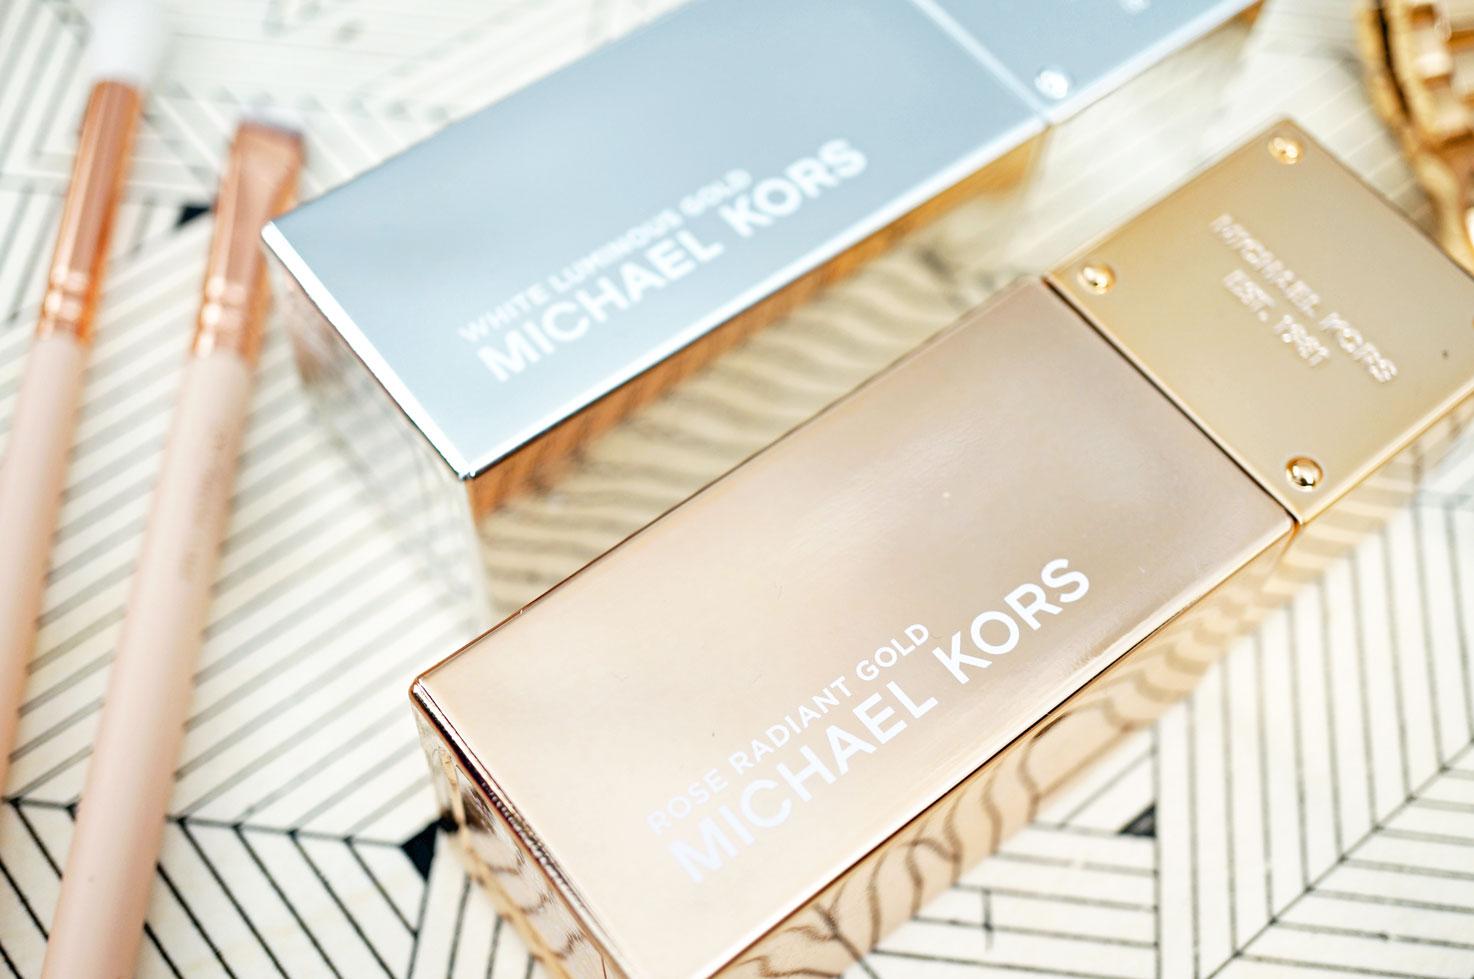 Michael Kors - The Gold Fragrance Collection - Thou Shalt Not Covet...